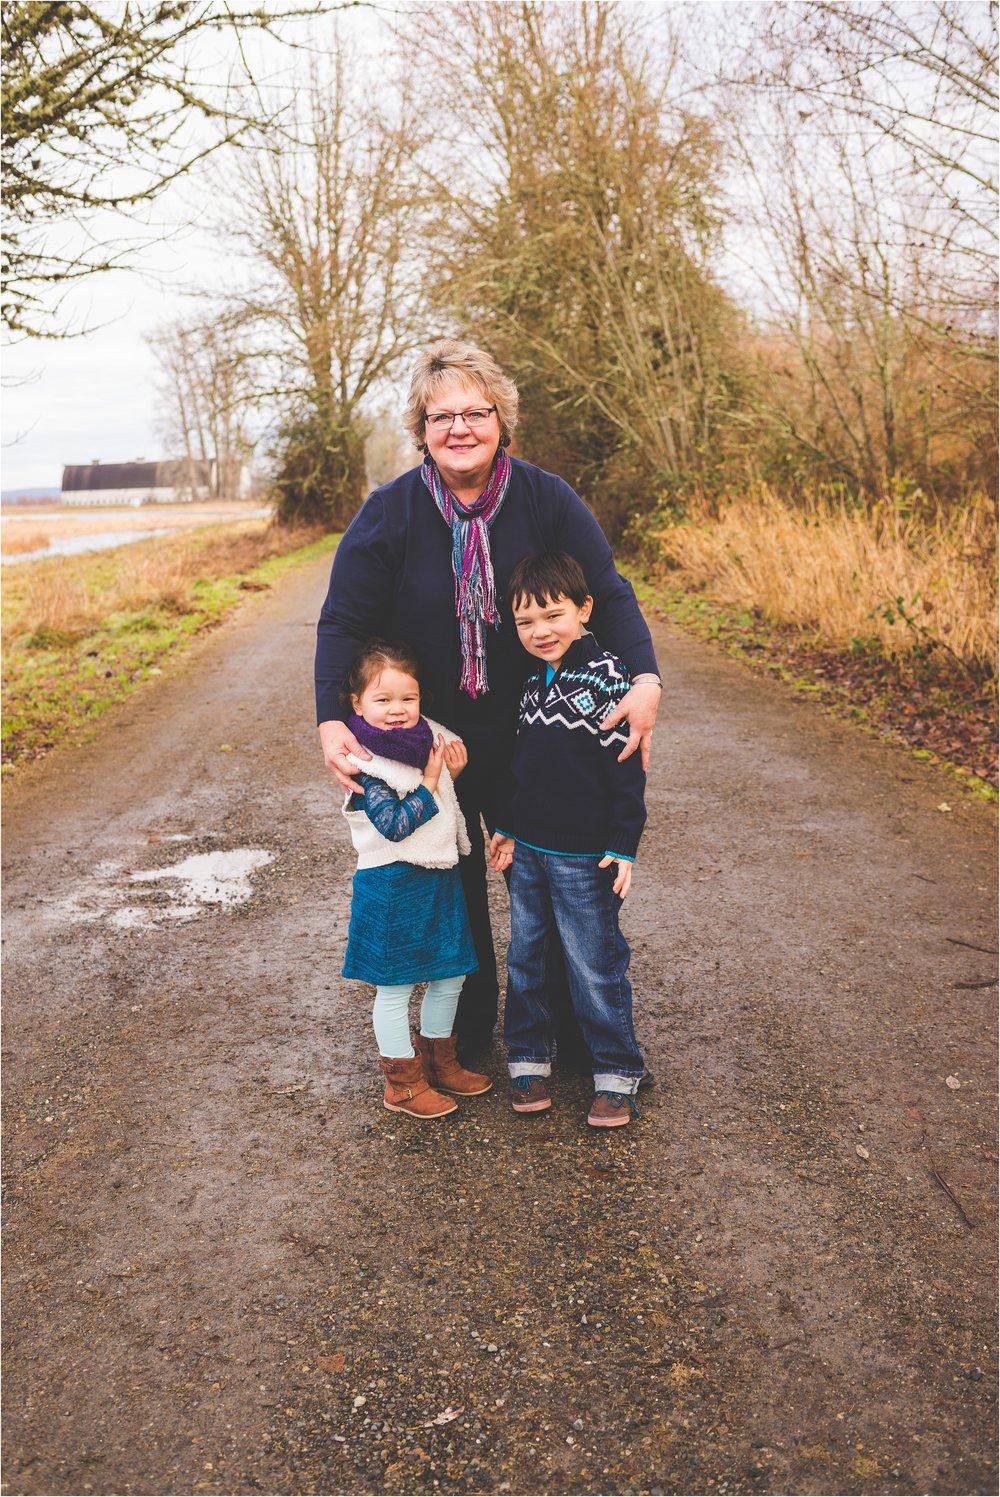 nisqually-wildlife-refuge-family-session-jannicka-mayte-olympia-wa-family-photographer_0007.jpg